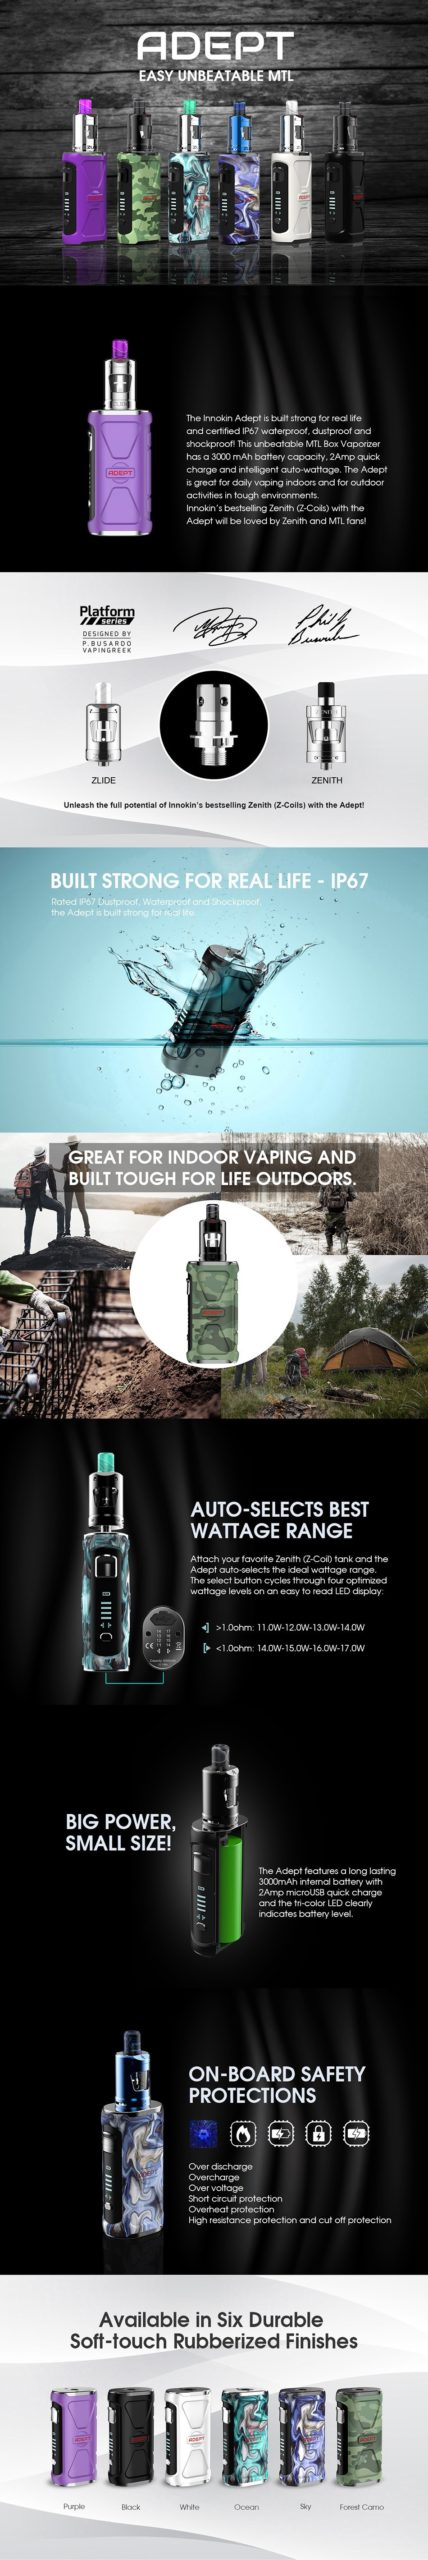 Innokin Adept Starter Kit with Zlide Tank 3000mAh